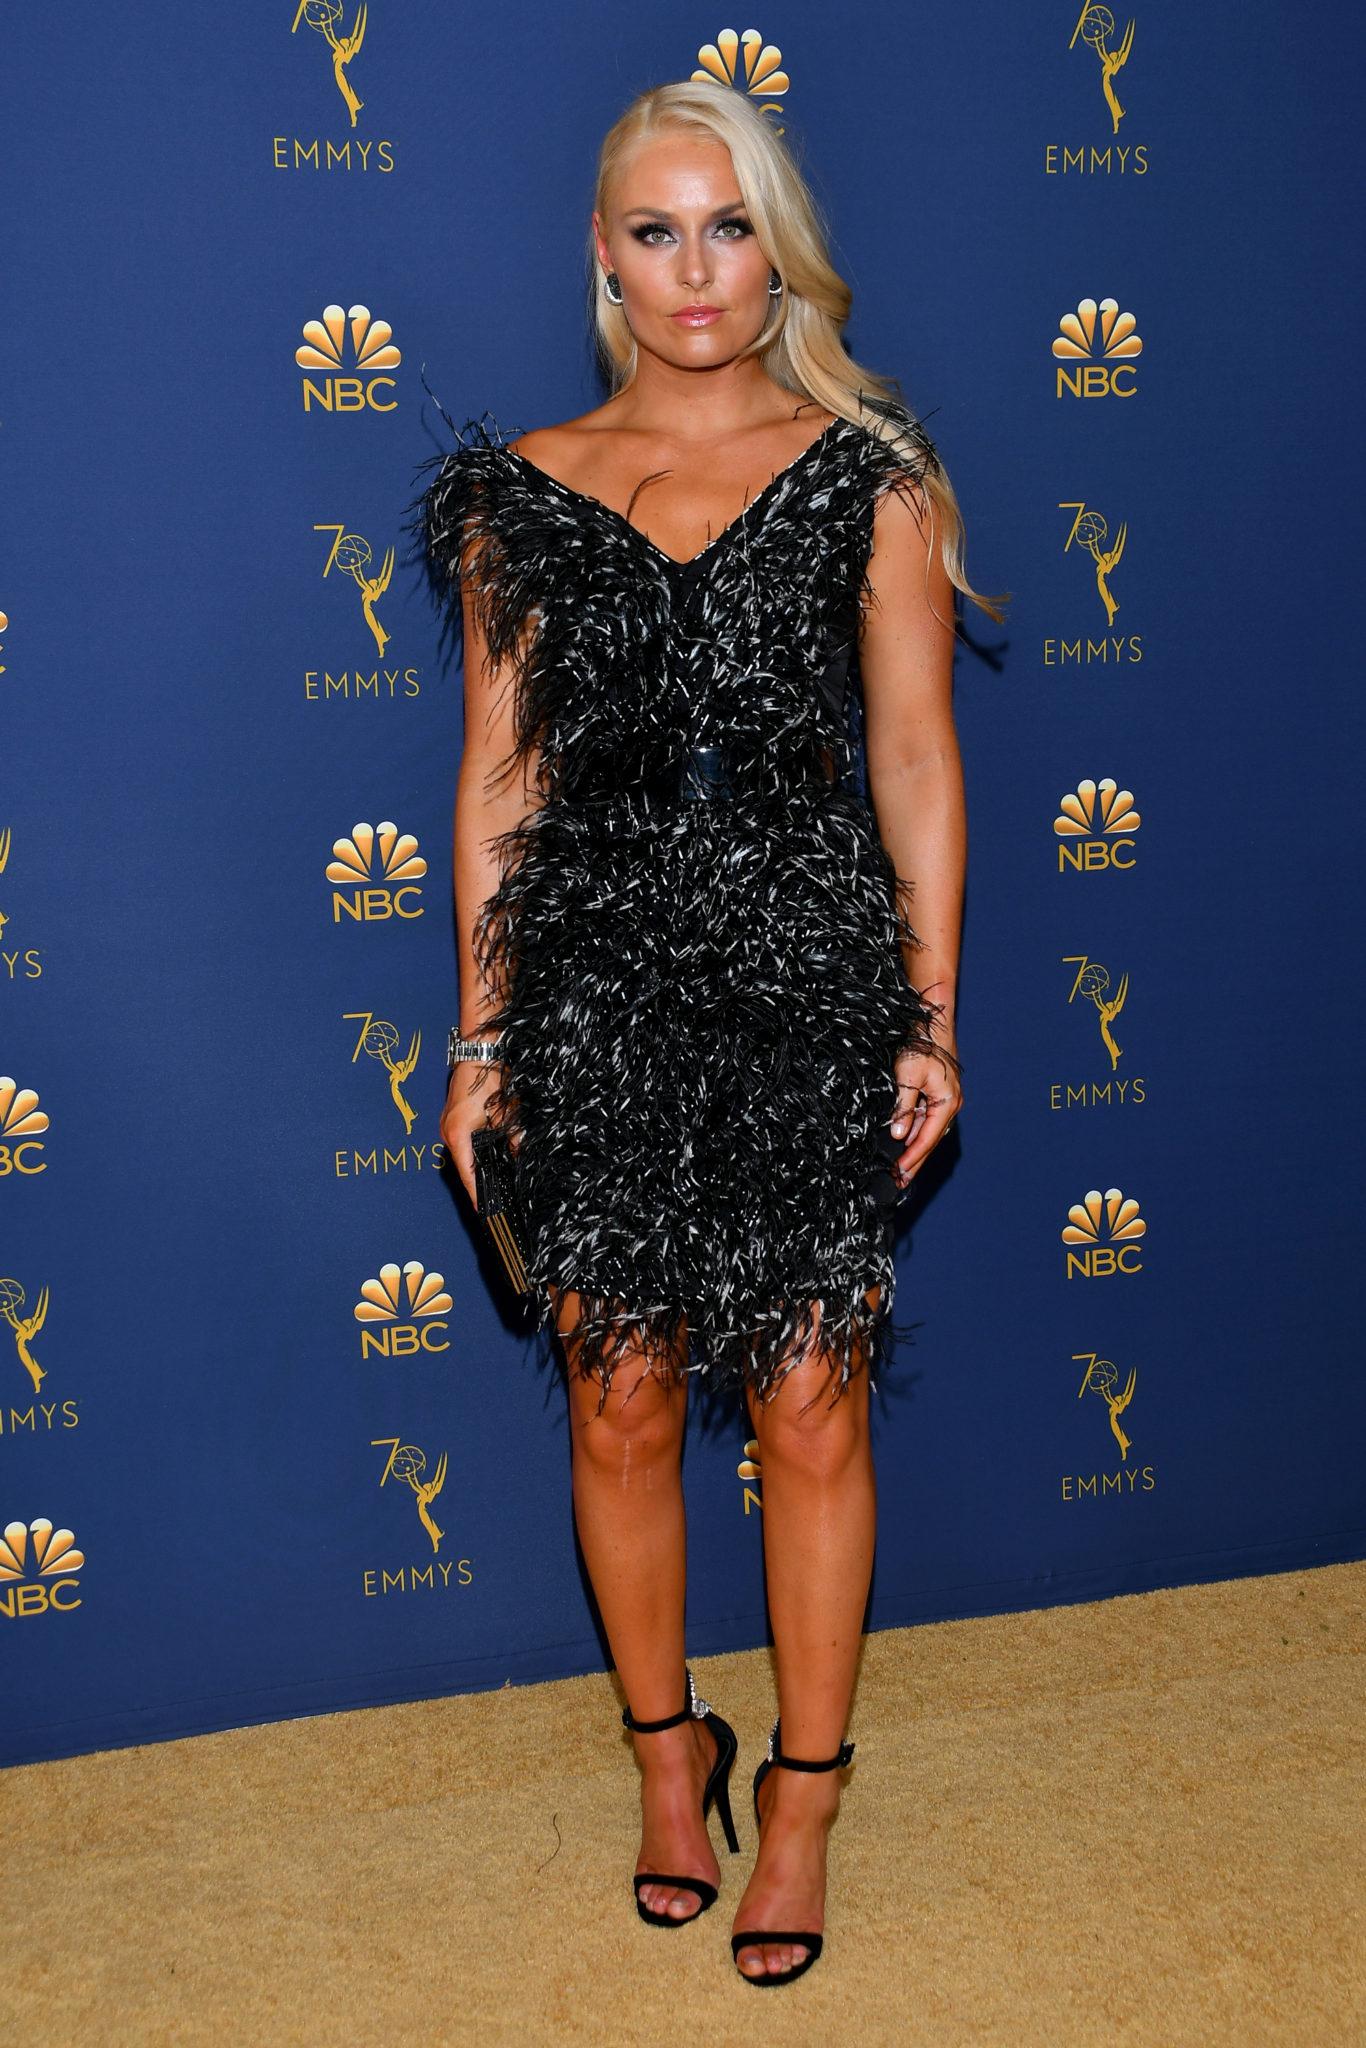 Lindsey Vonn Emmys 4Chion Lifestyle